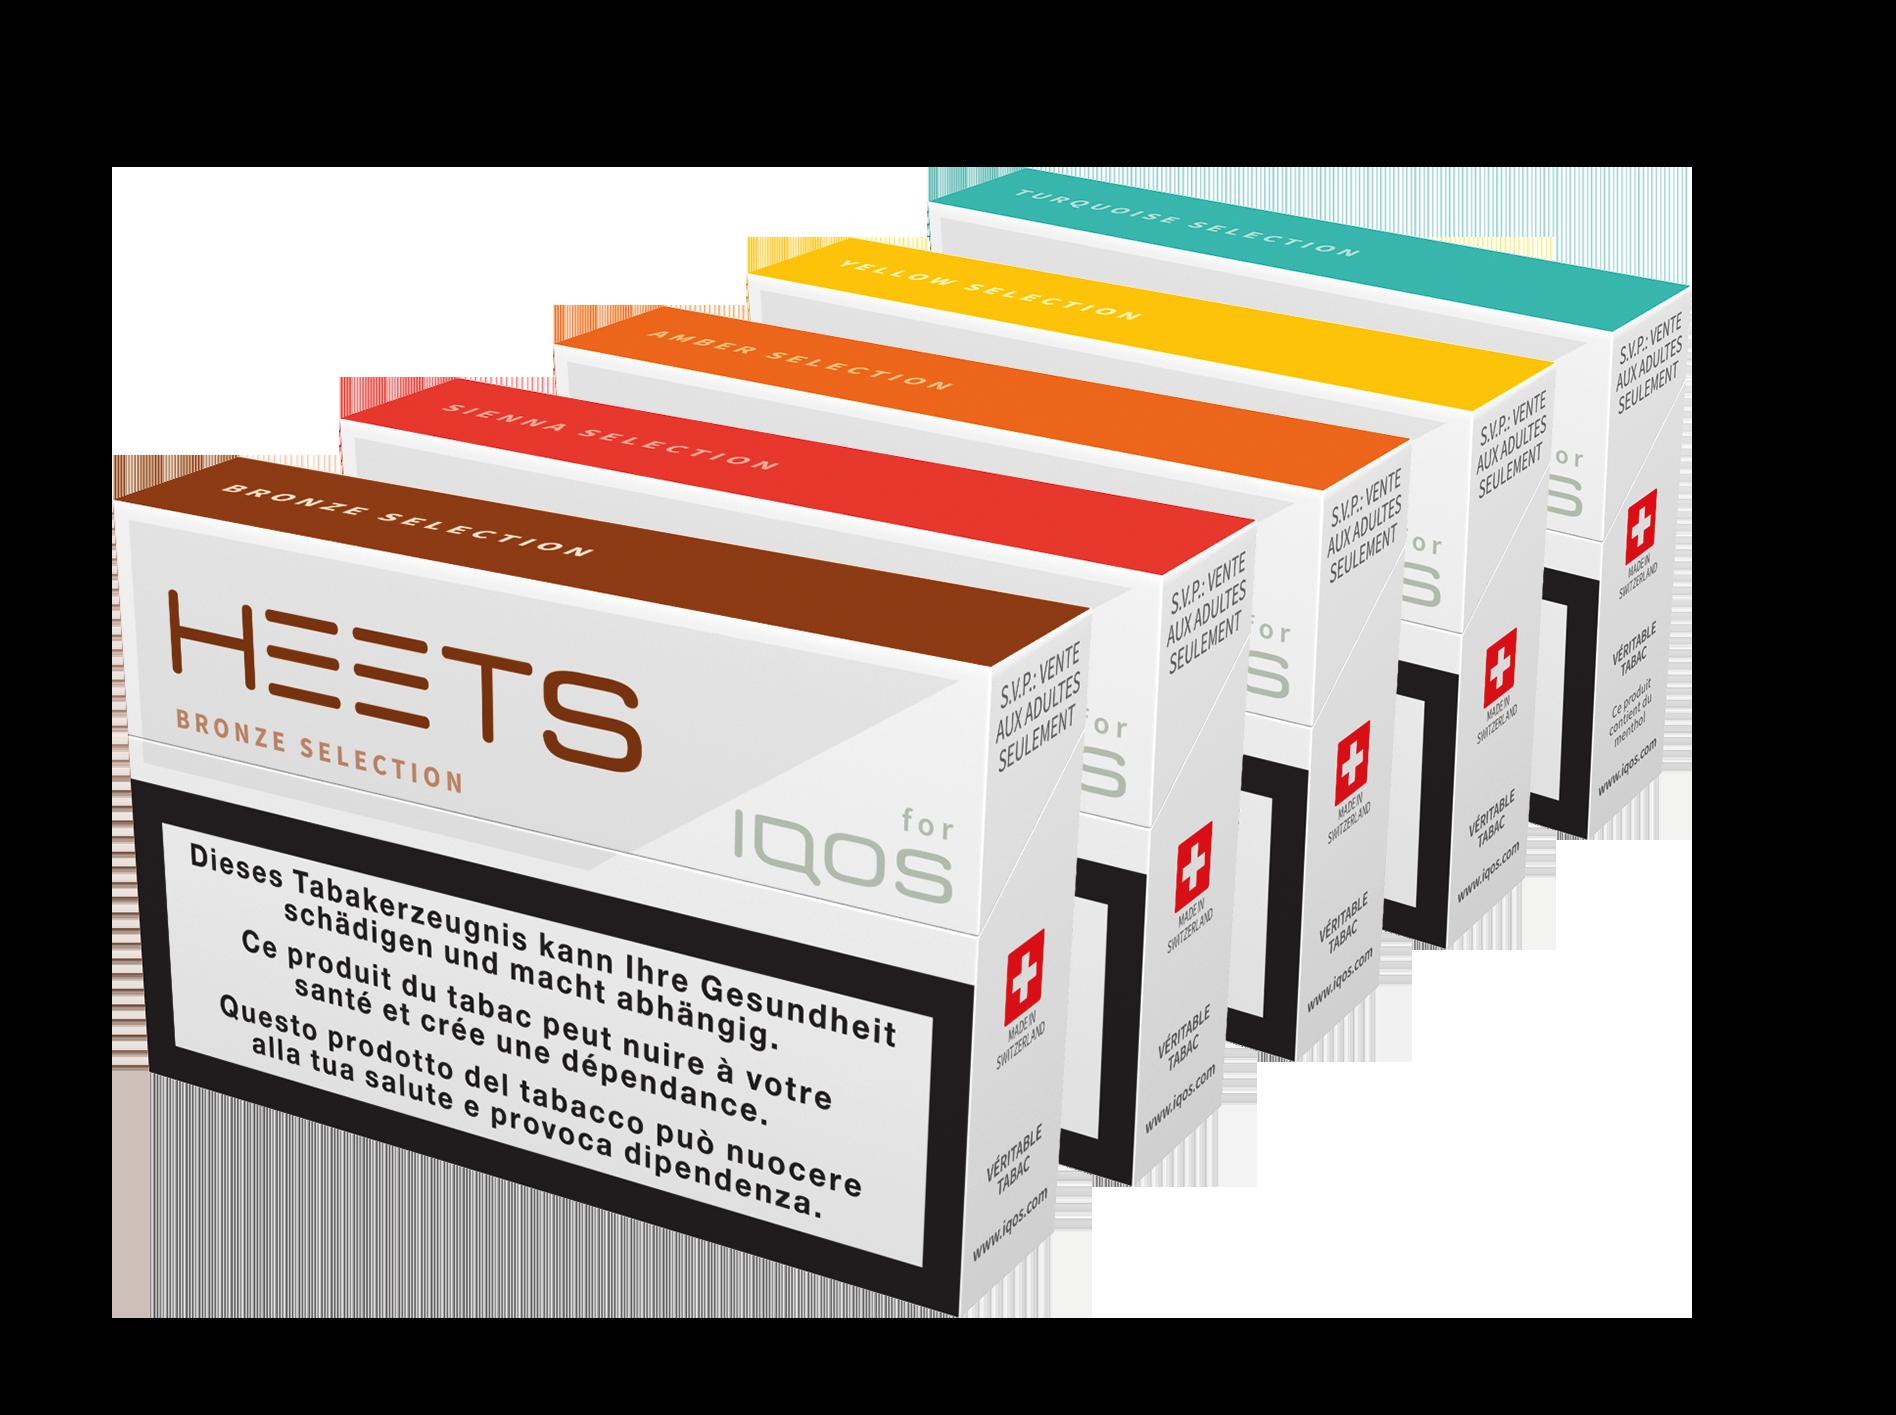 5-HEETS-Packs-Selected-Switzerland